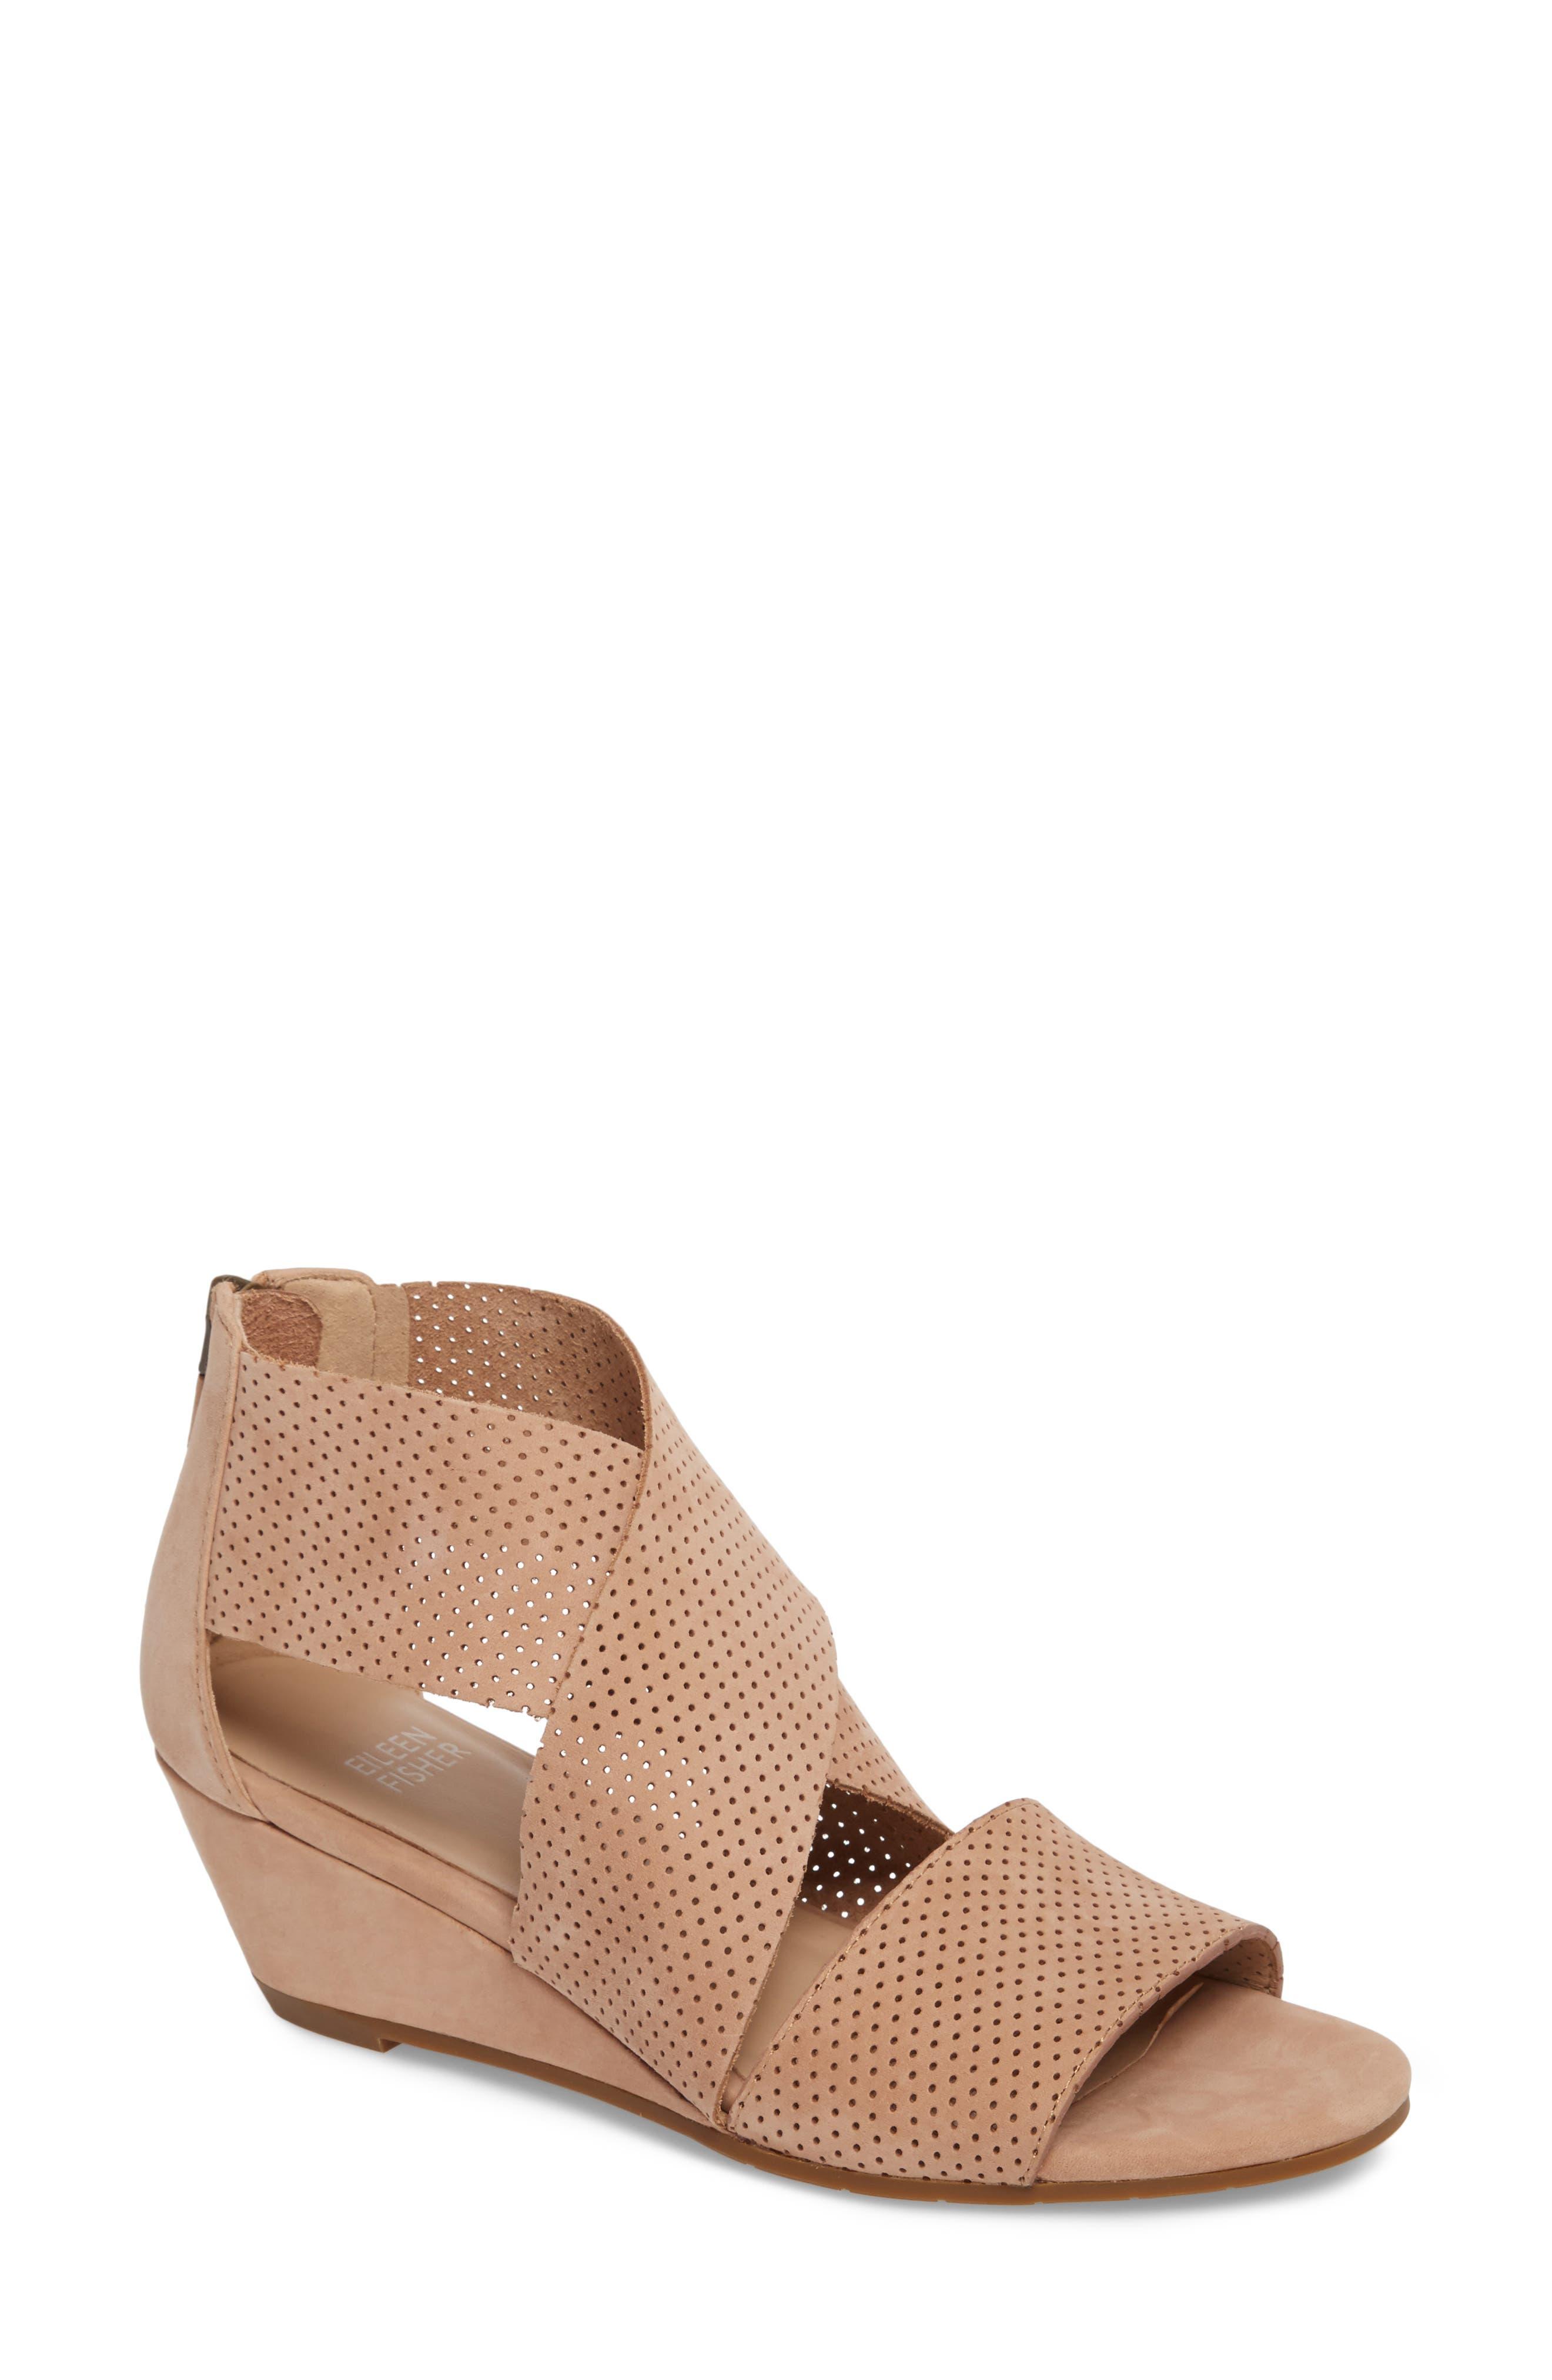 Eileen Fisher Women's Kes Wedge Sandal